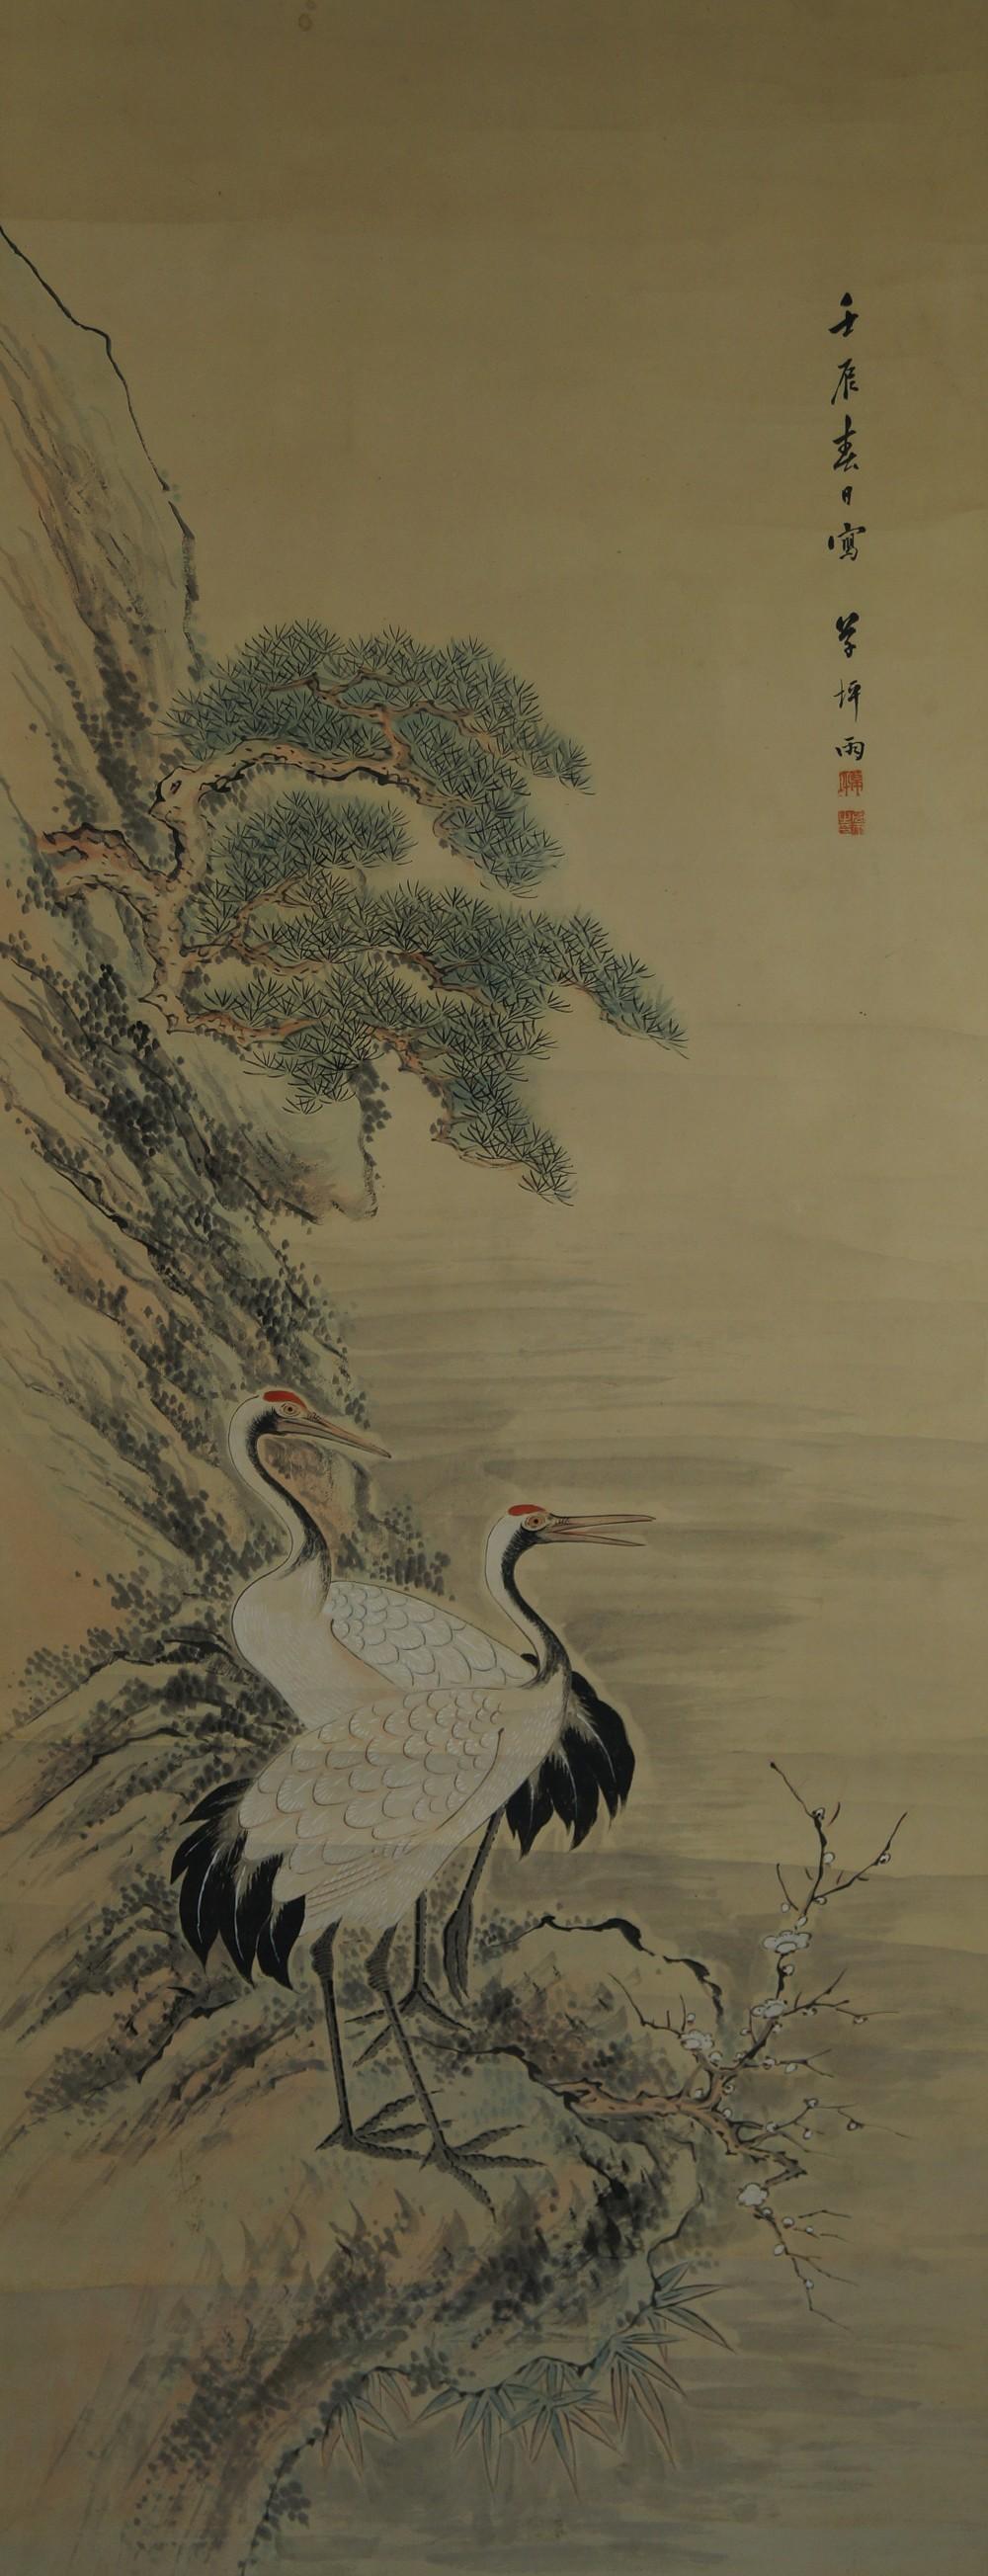 Zwei Kraniche - Japanisches Rollbild (Kakejiku, Kakemono)